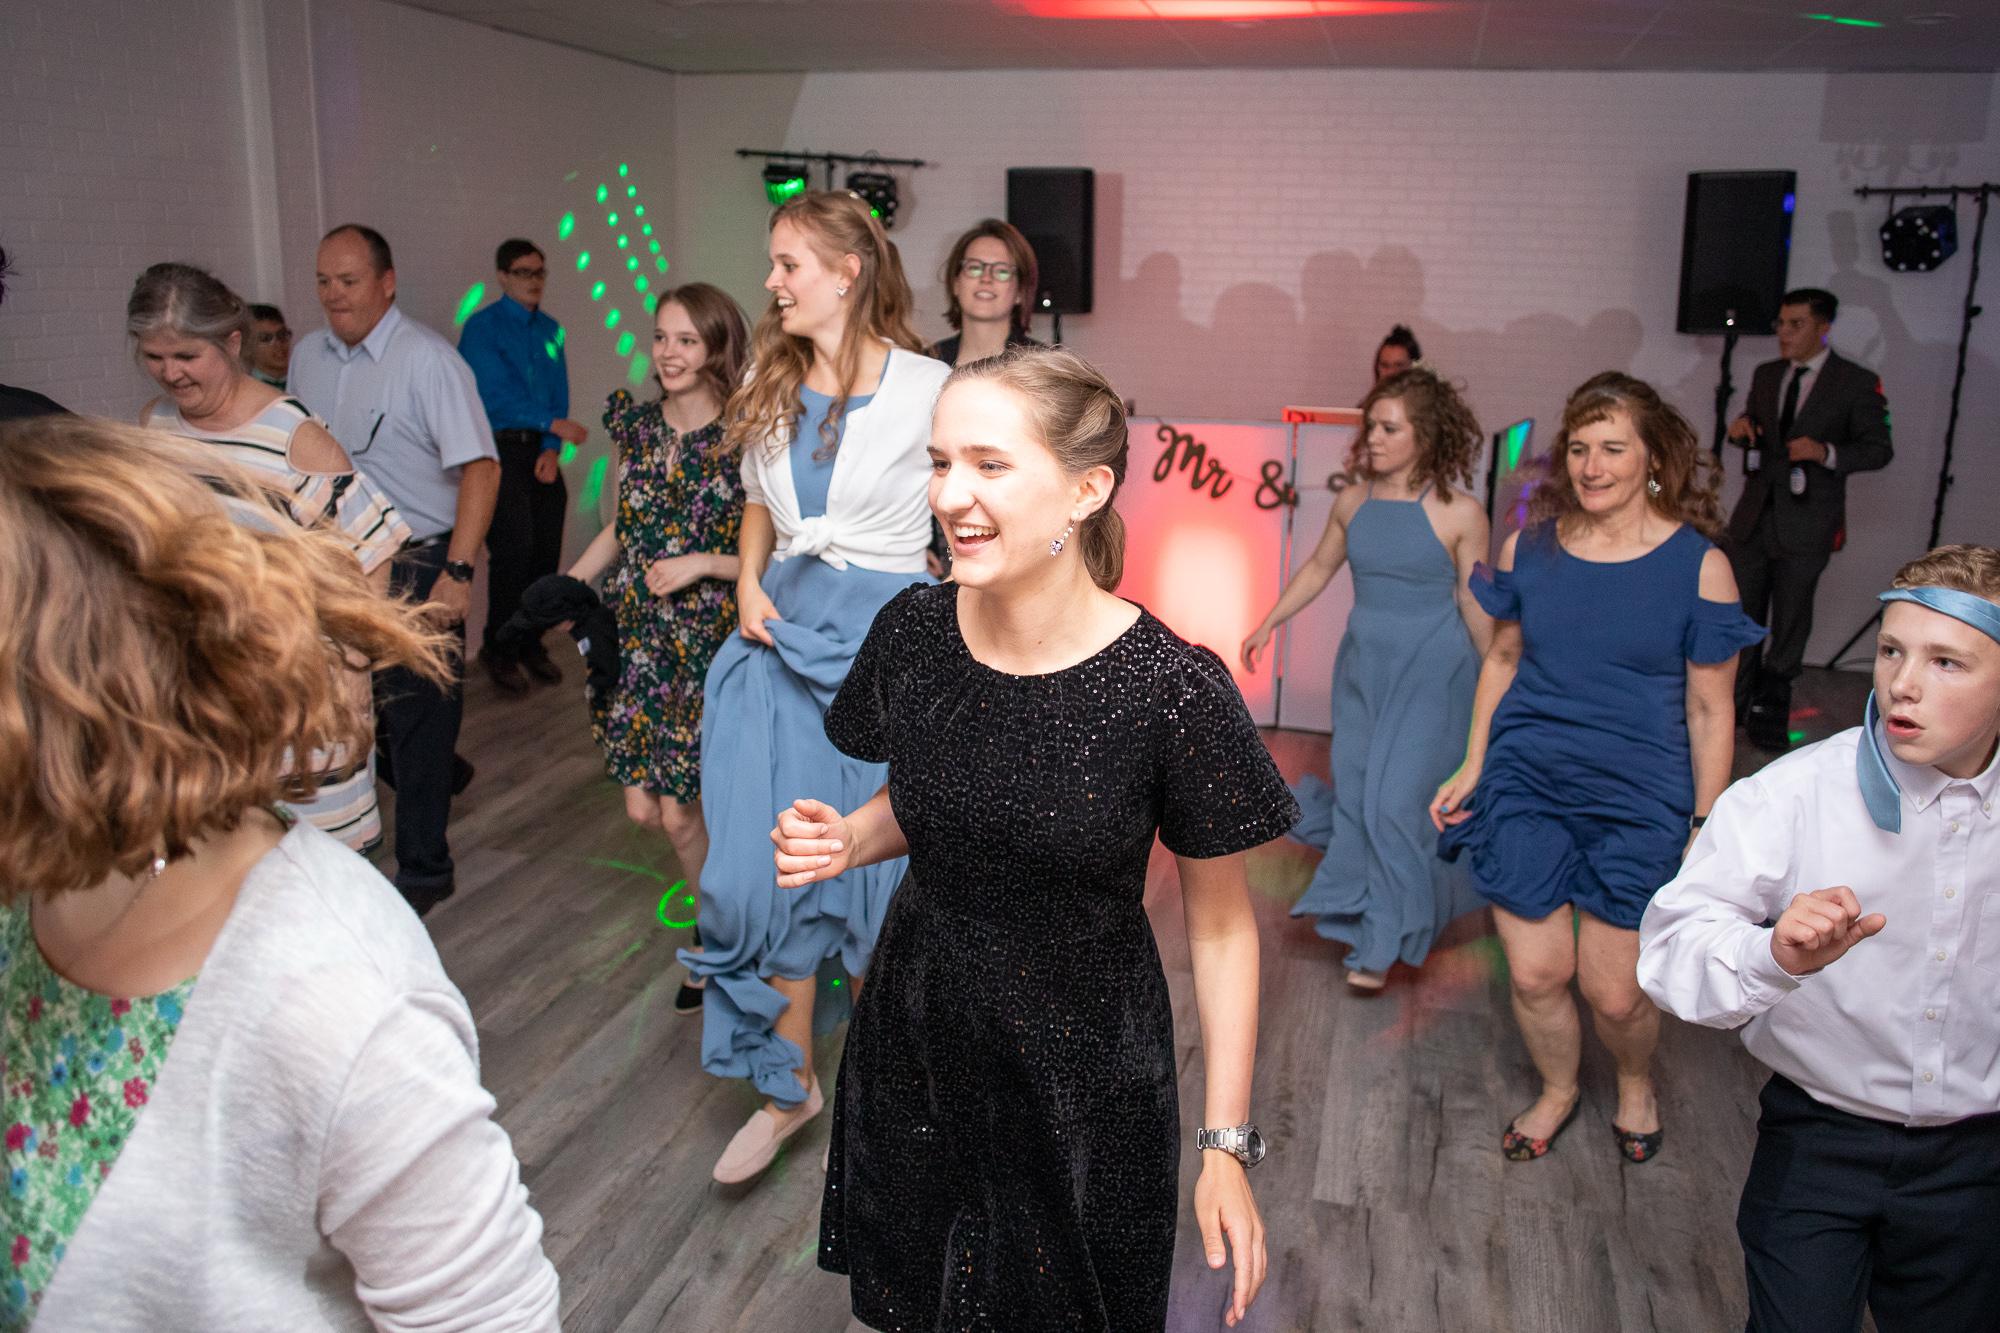 pittsburgh engagement photographers, pittsburgh wedding photographers, wedding photographers pittsburgh, christian wedding photographers, engagement photographer pittsburgh